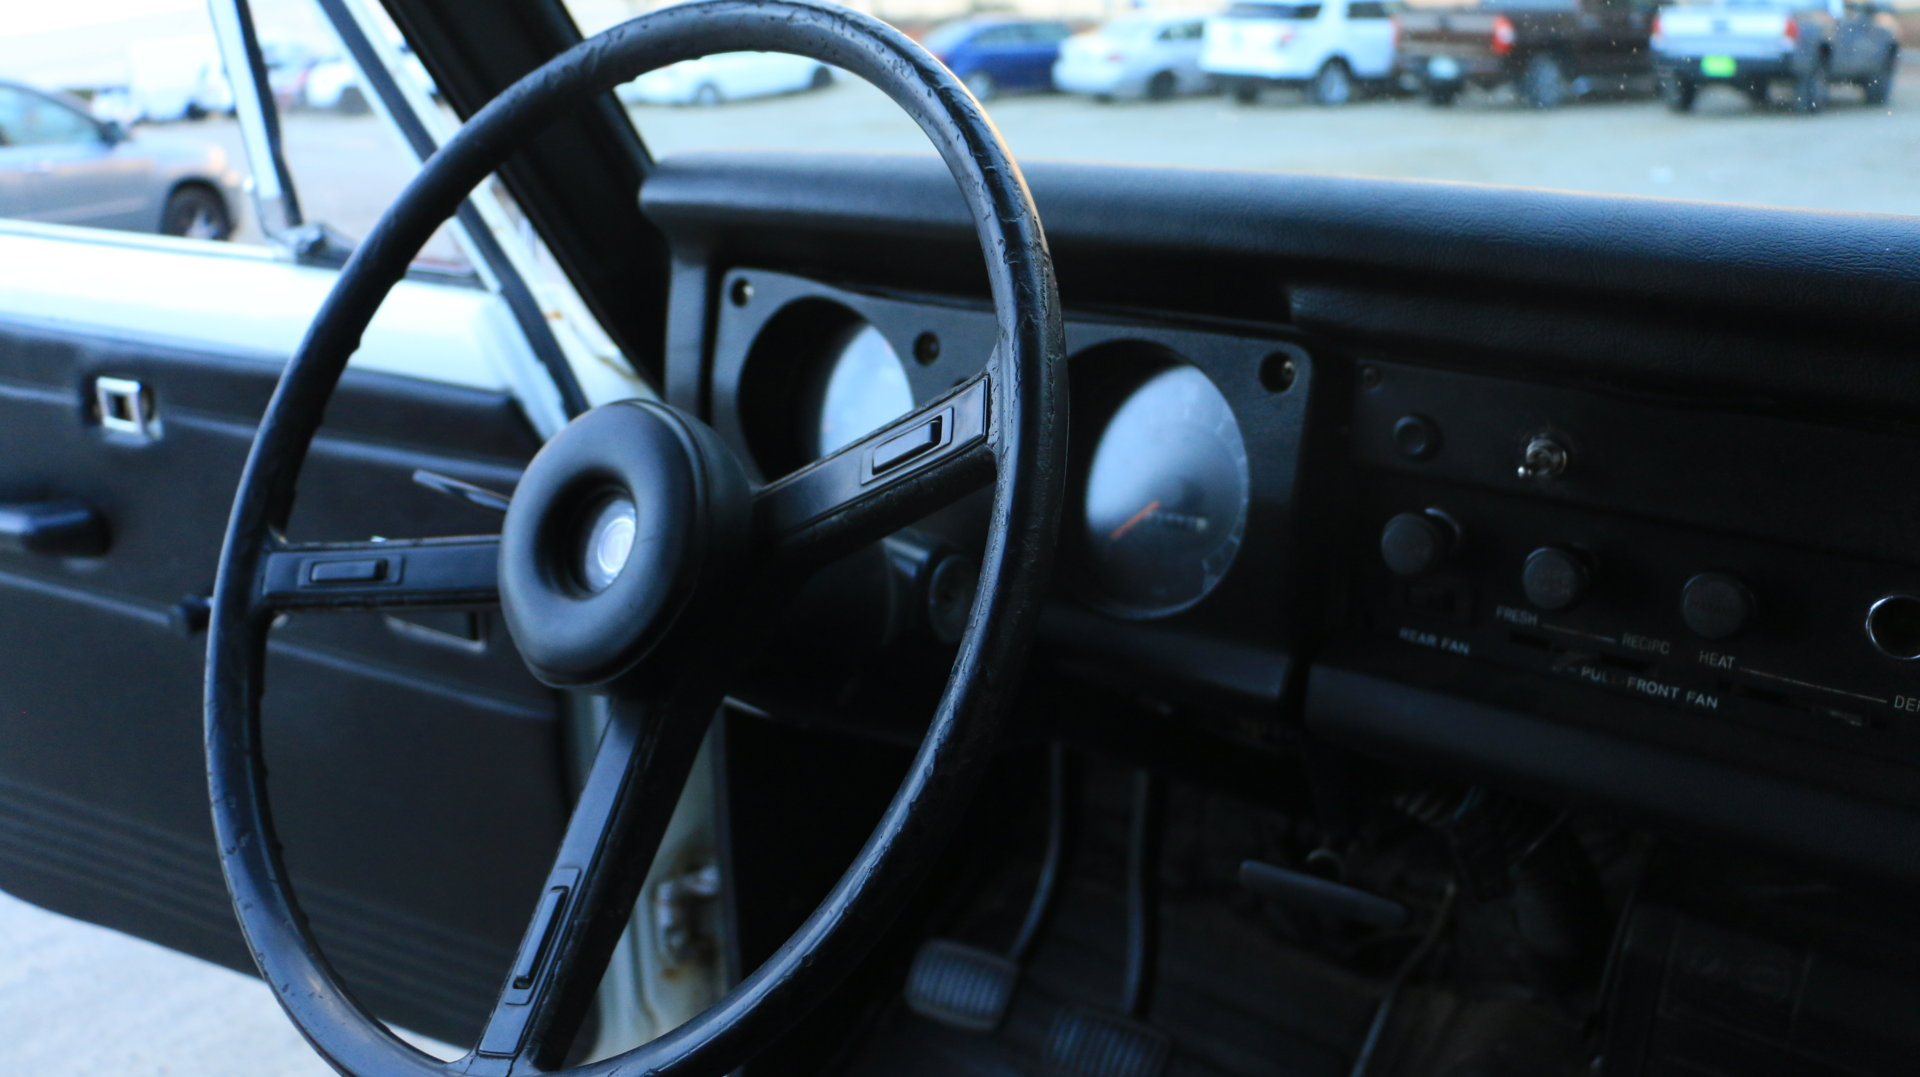 For Sale 1973 Fj55 Land Cruiser Ih8mud Forum Toyota Fuel Tank Img 5190